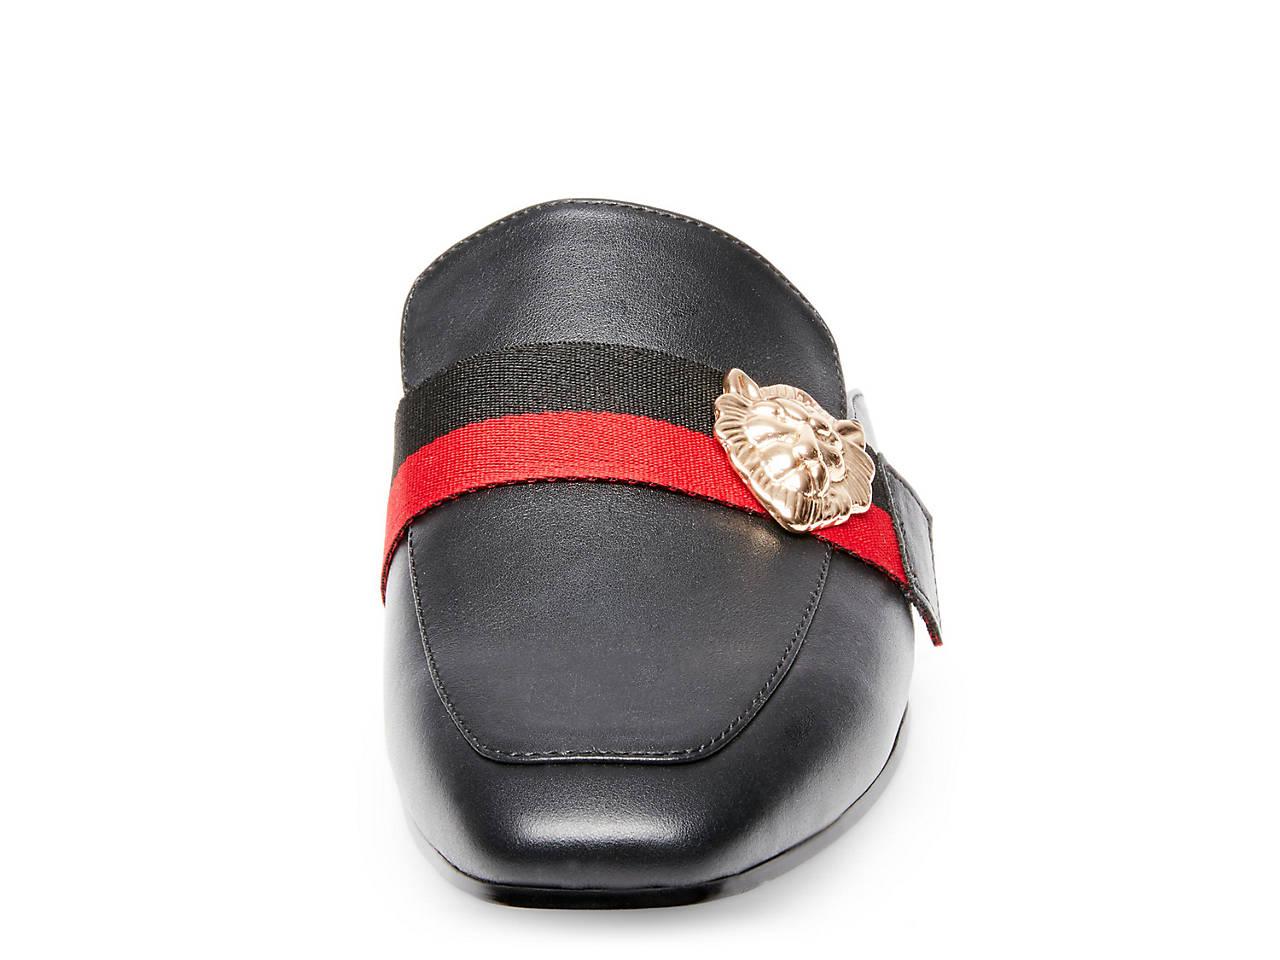 d352e059d01 Steve Madden Karisma Mule Women s Shoes